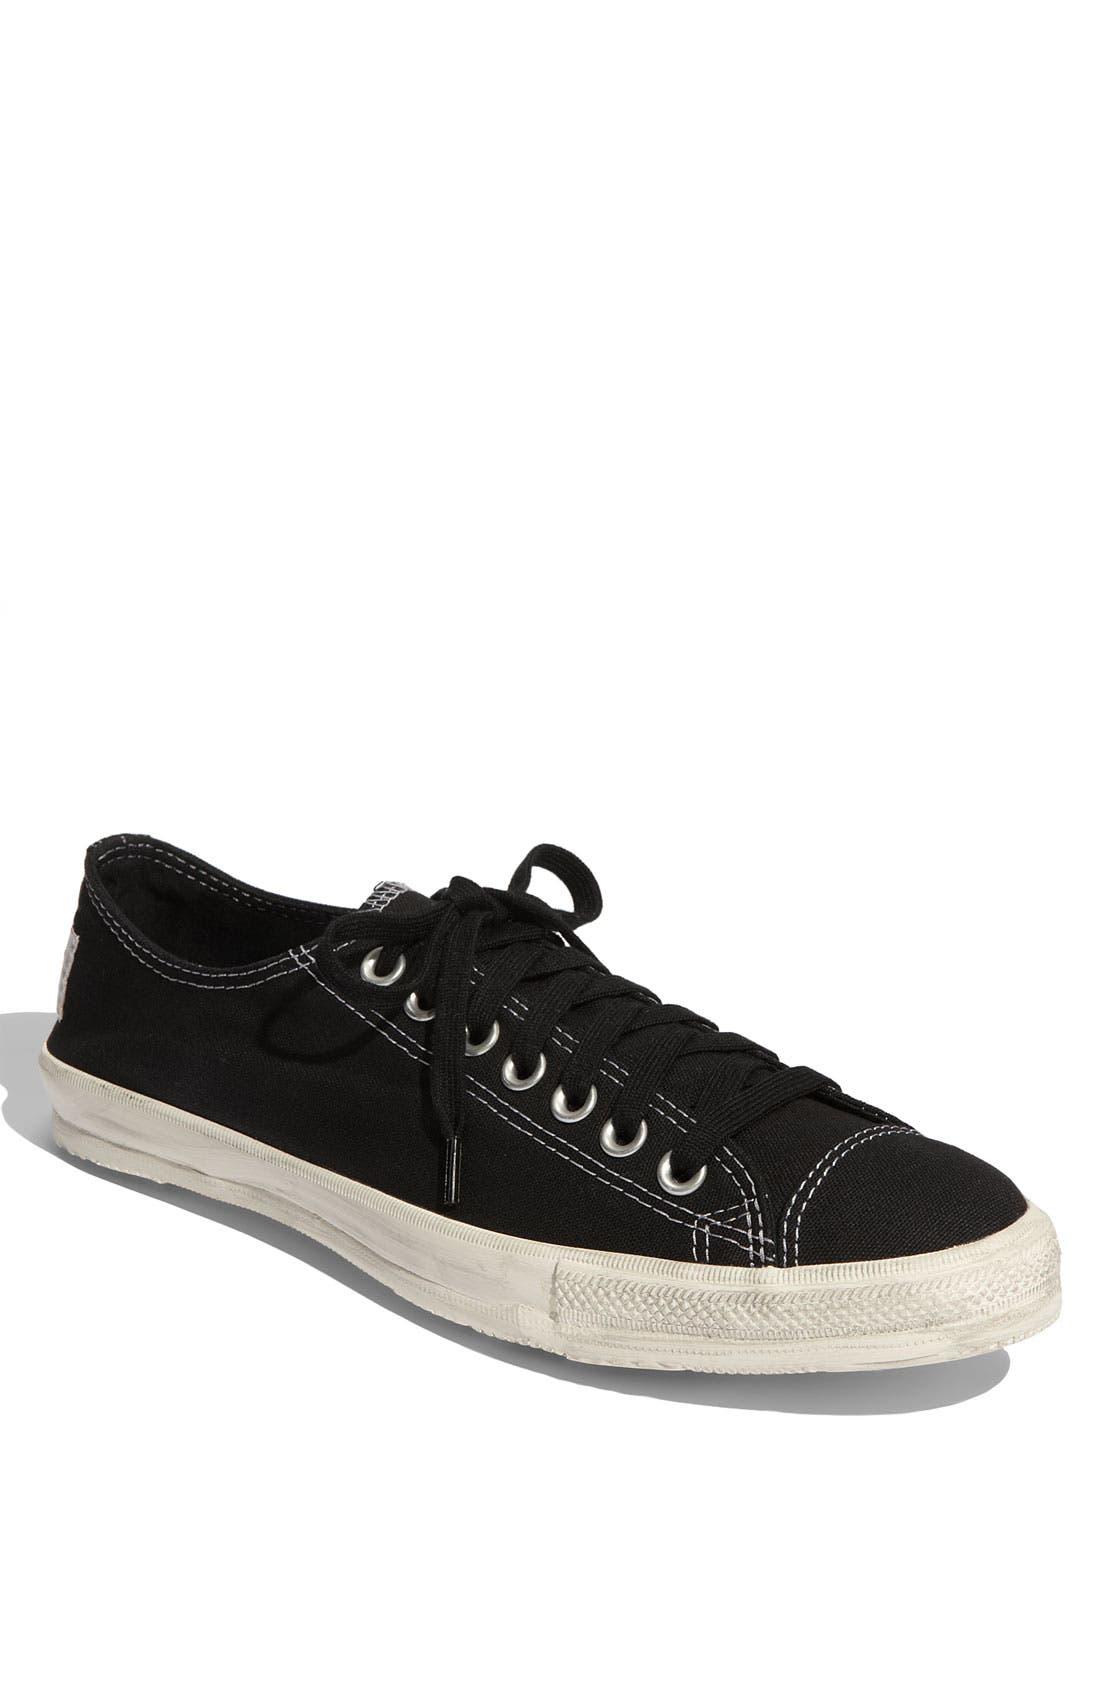 Chuck Taylor<sup>®</sup> 'AS Coast' Sneaker,                             Main thumbnail 1, color,                             001